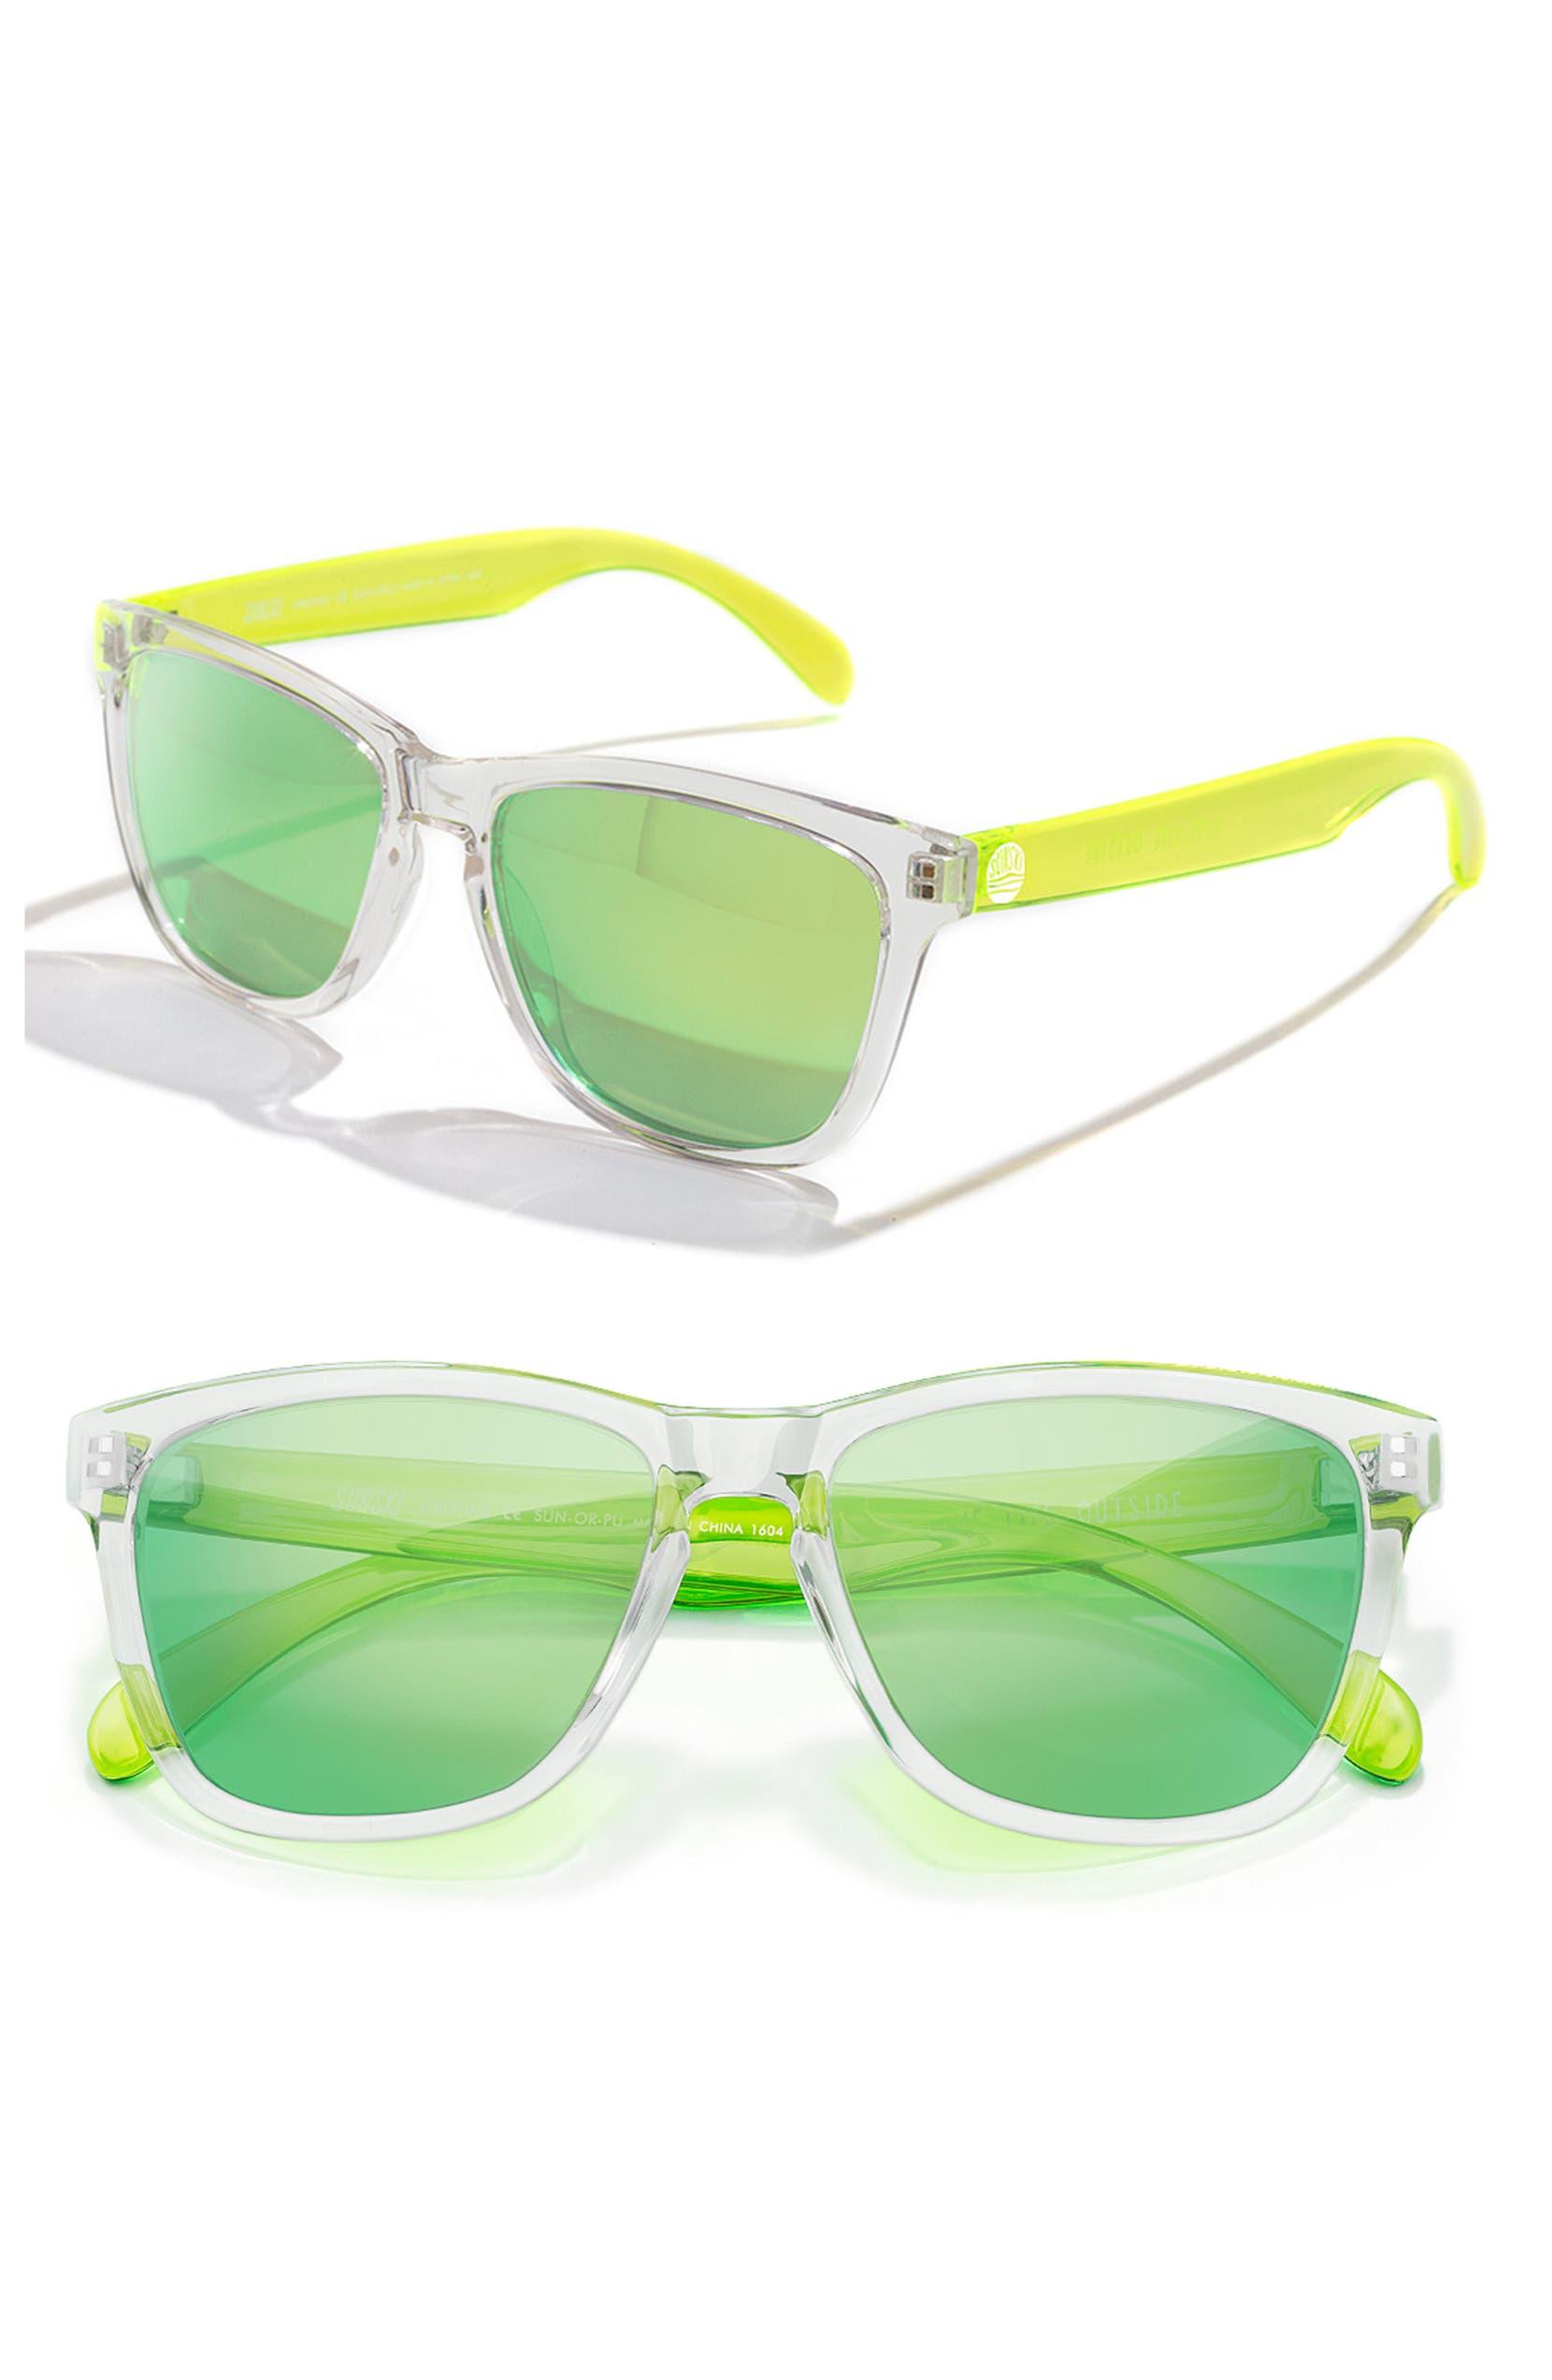 ae2a50196e Sunski Original 53mm Polarized Sunglasses